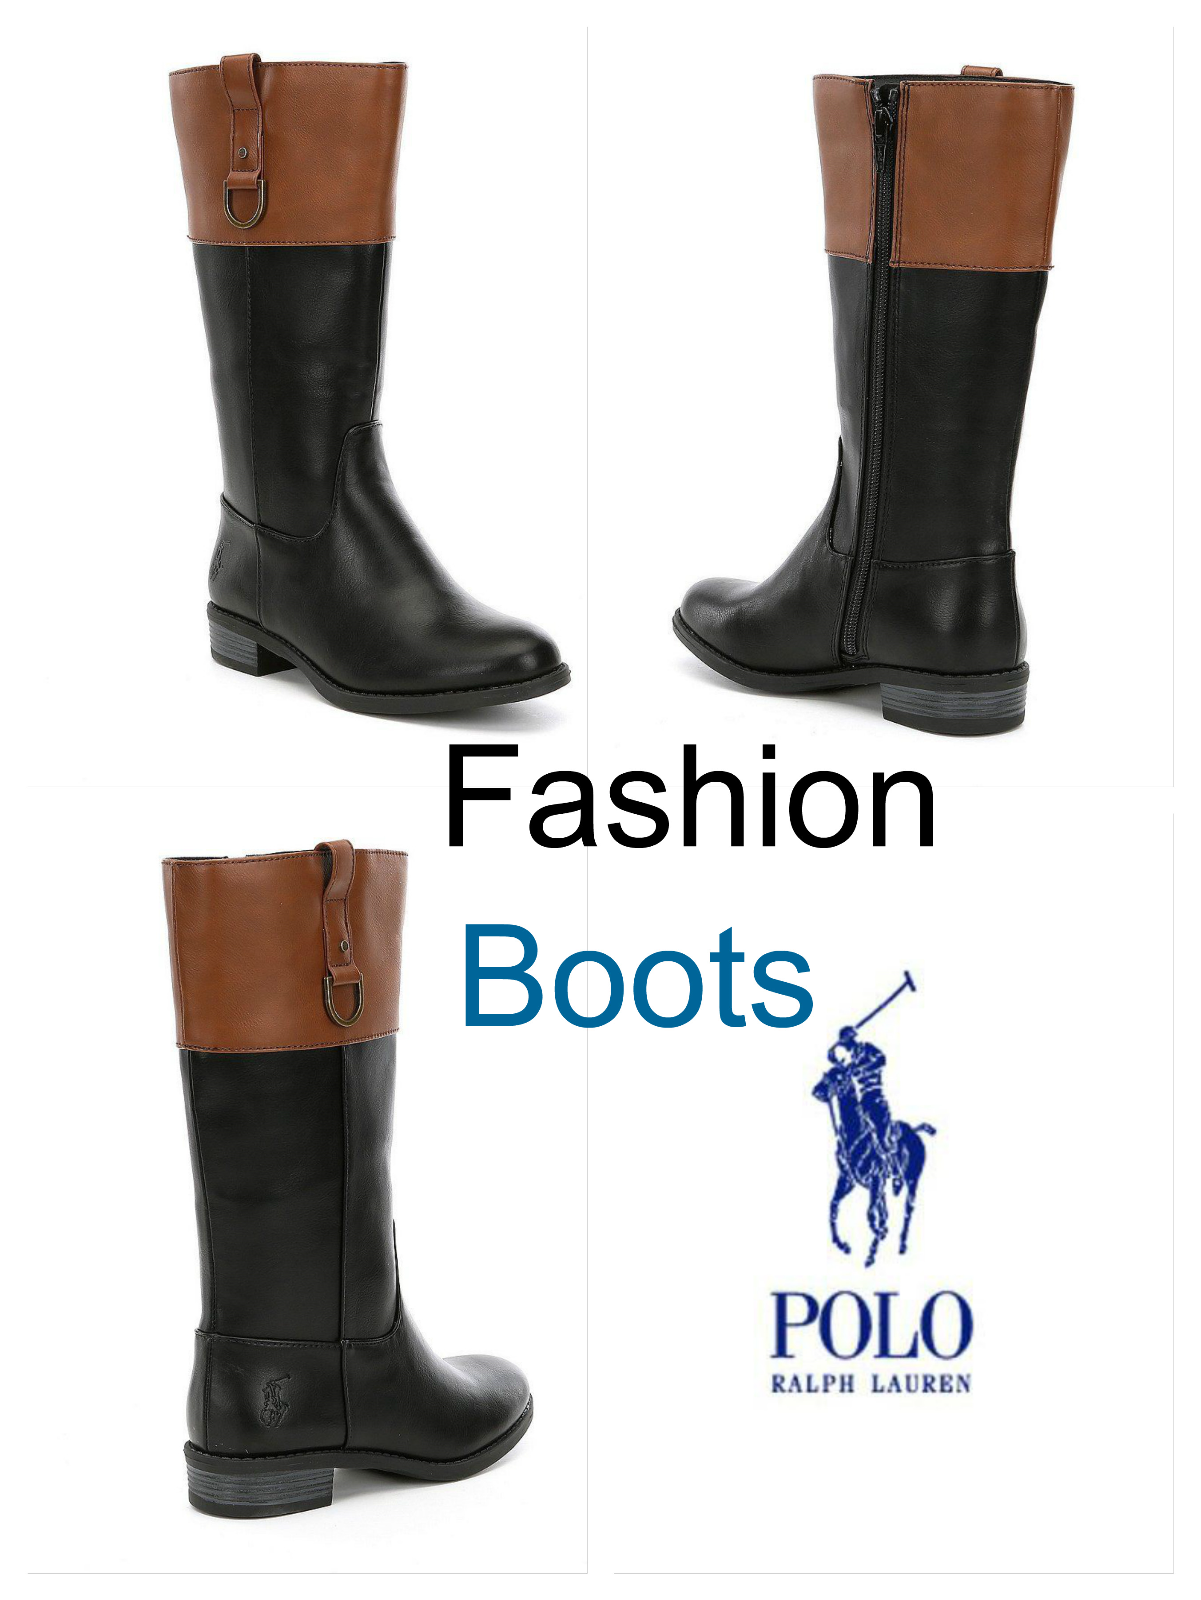 Polo Ralph Lauren Girls Fashion Leather Boots MESA Black Tan Boots